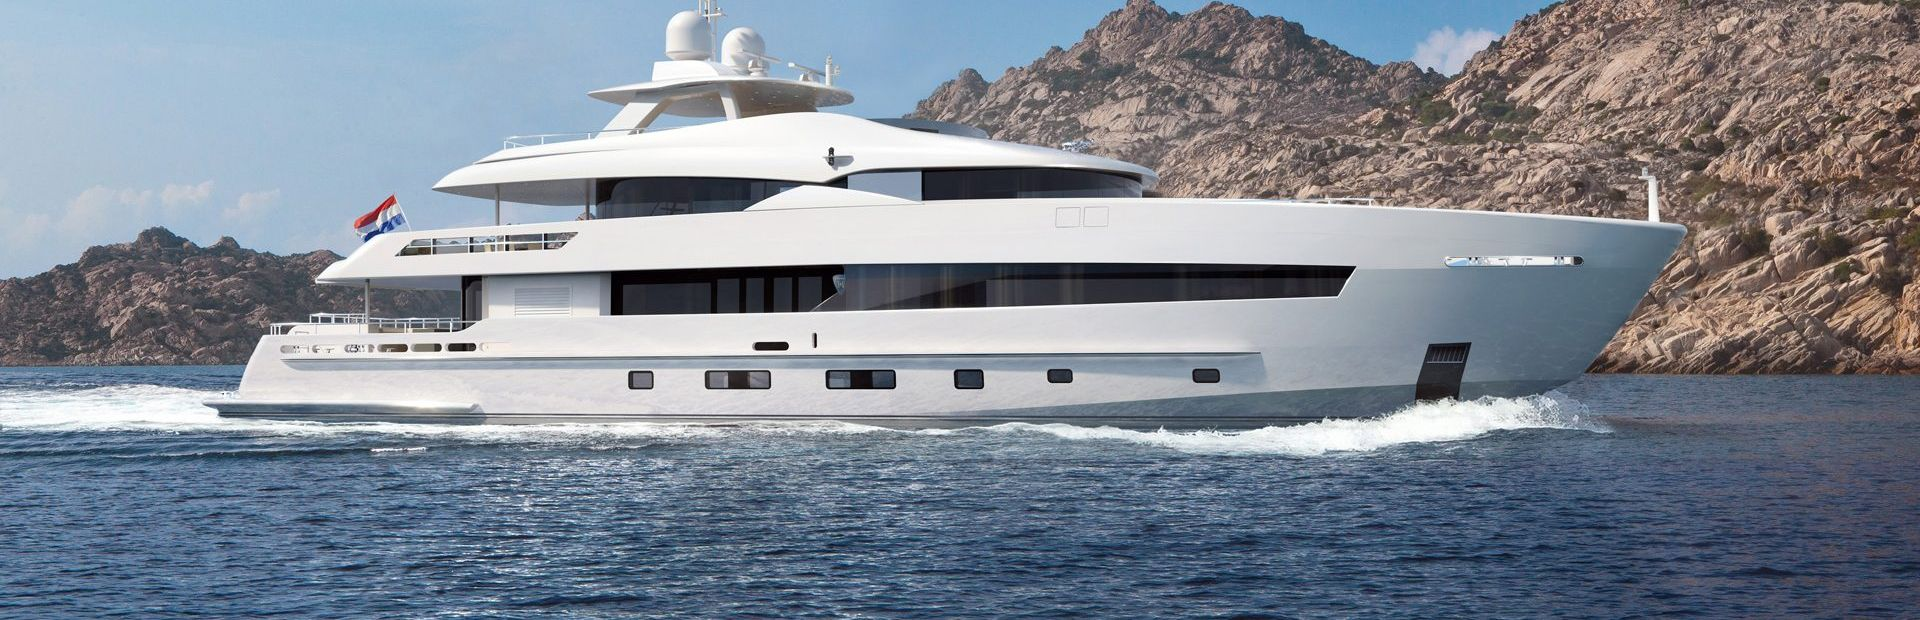 42m Steel Yacht Charter